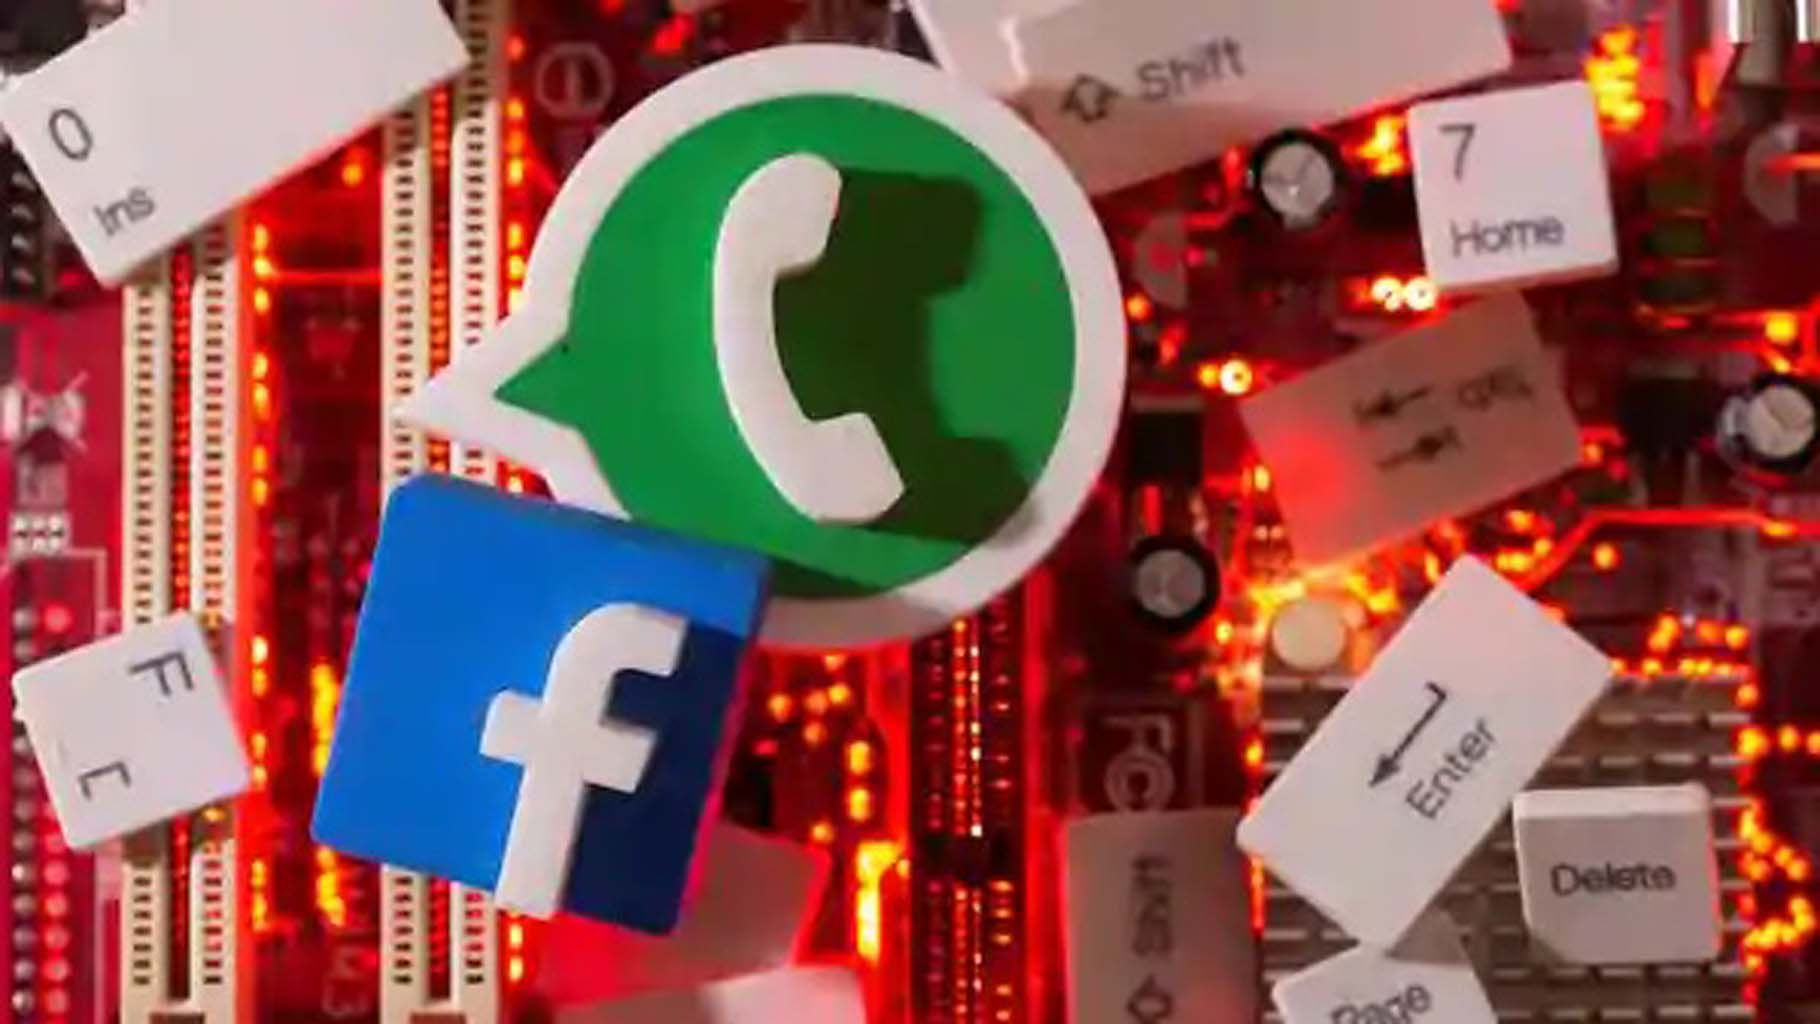 Data Protection, Facebook whatsapp data sharing, Privacy violations, WhatsAapp